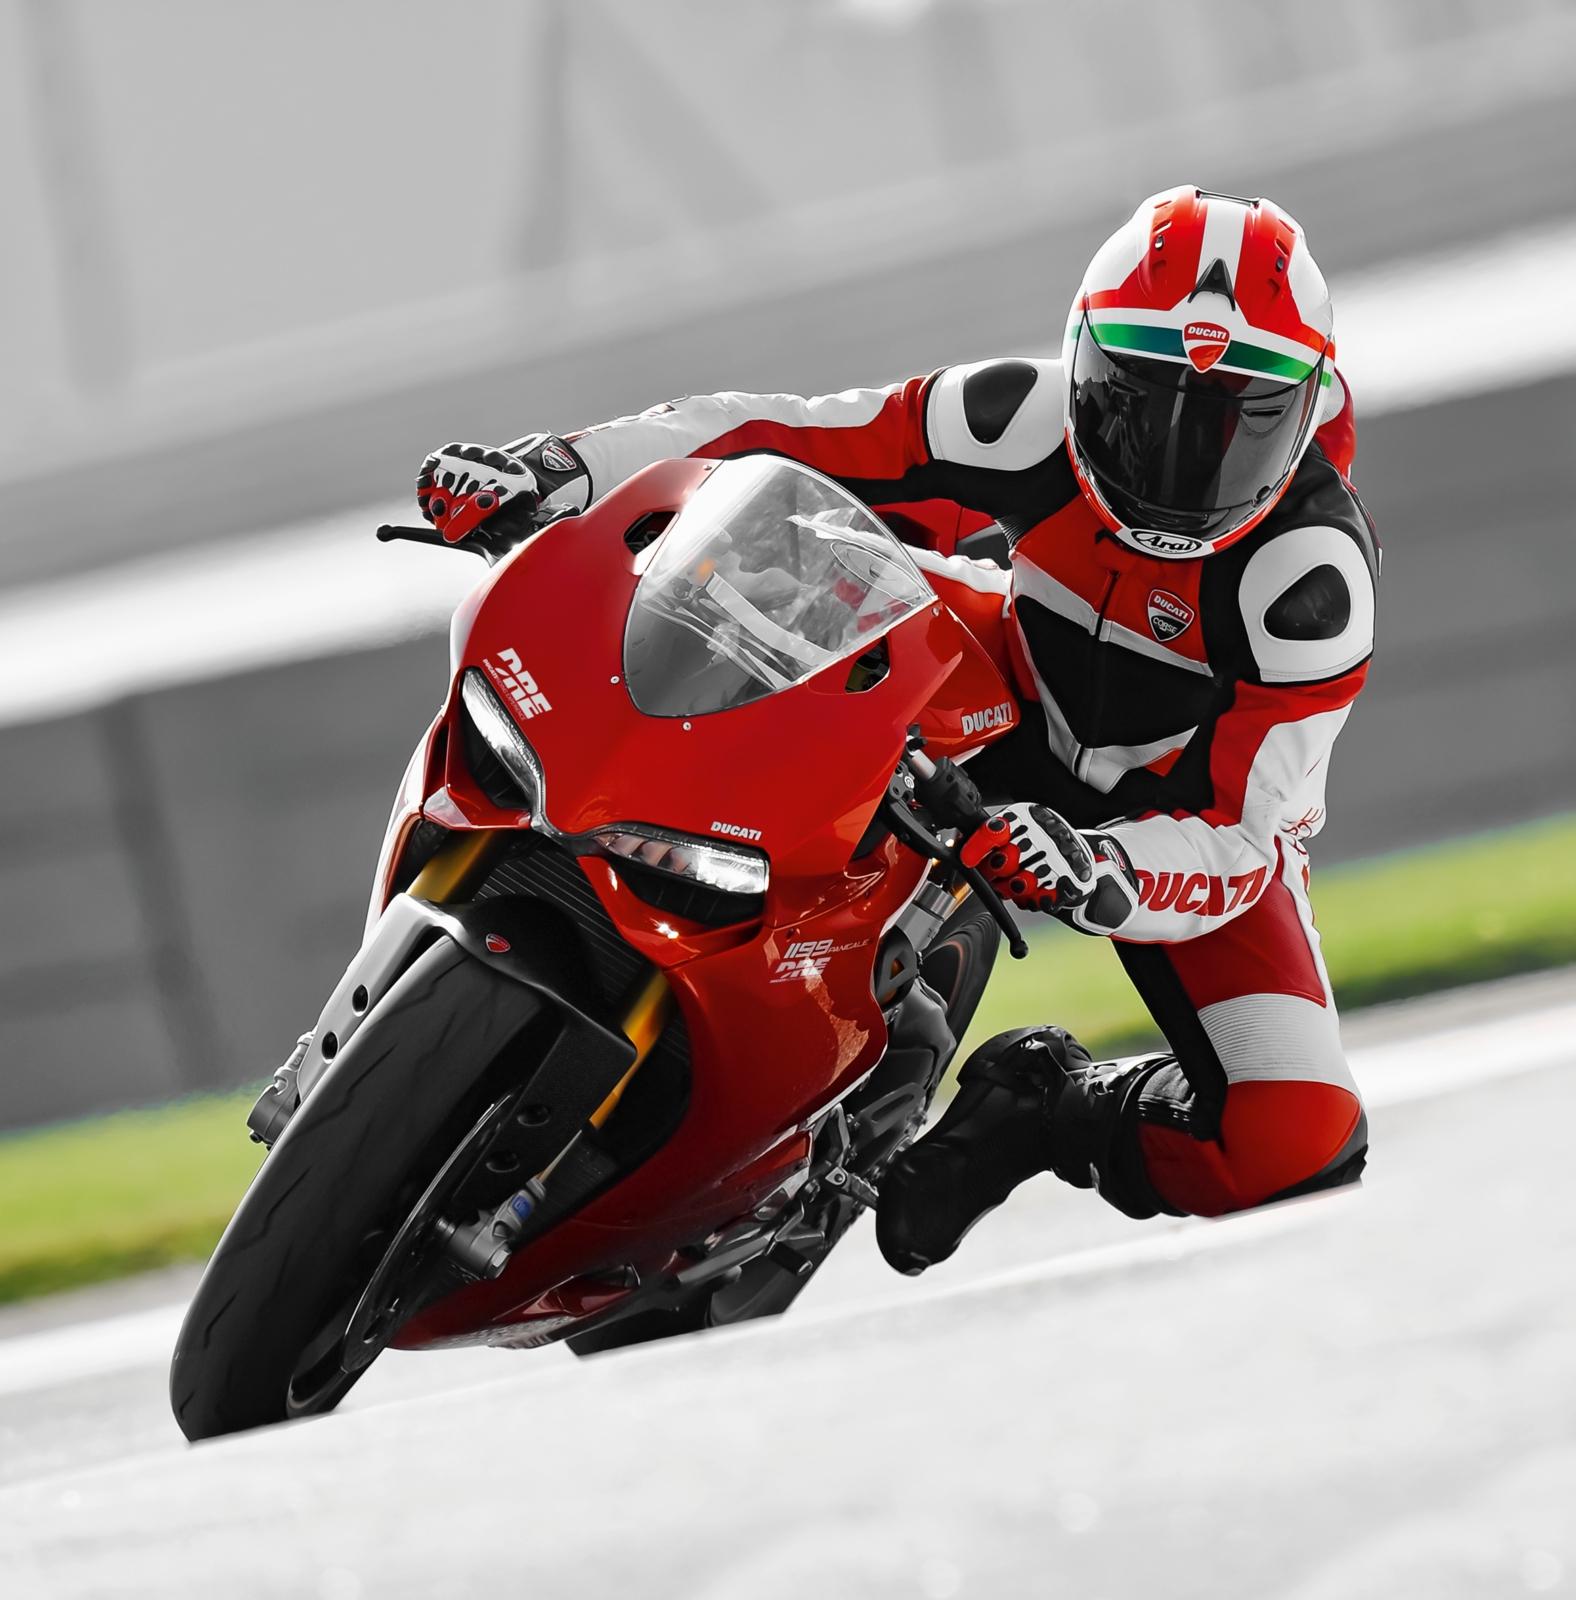 Ducati Riding Experience Announces Exclusive Date at Assen - autoevolution